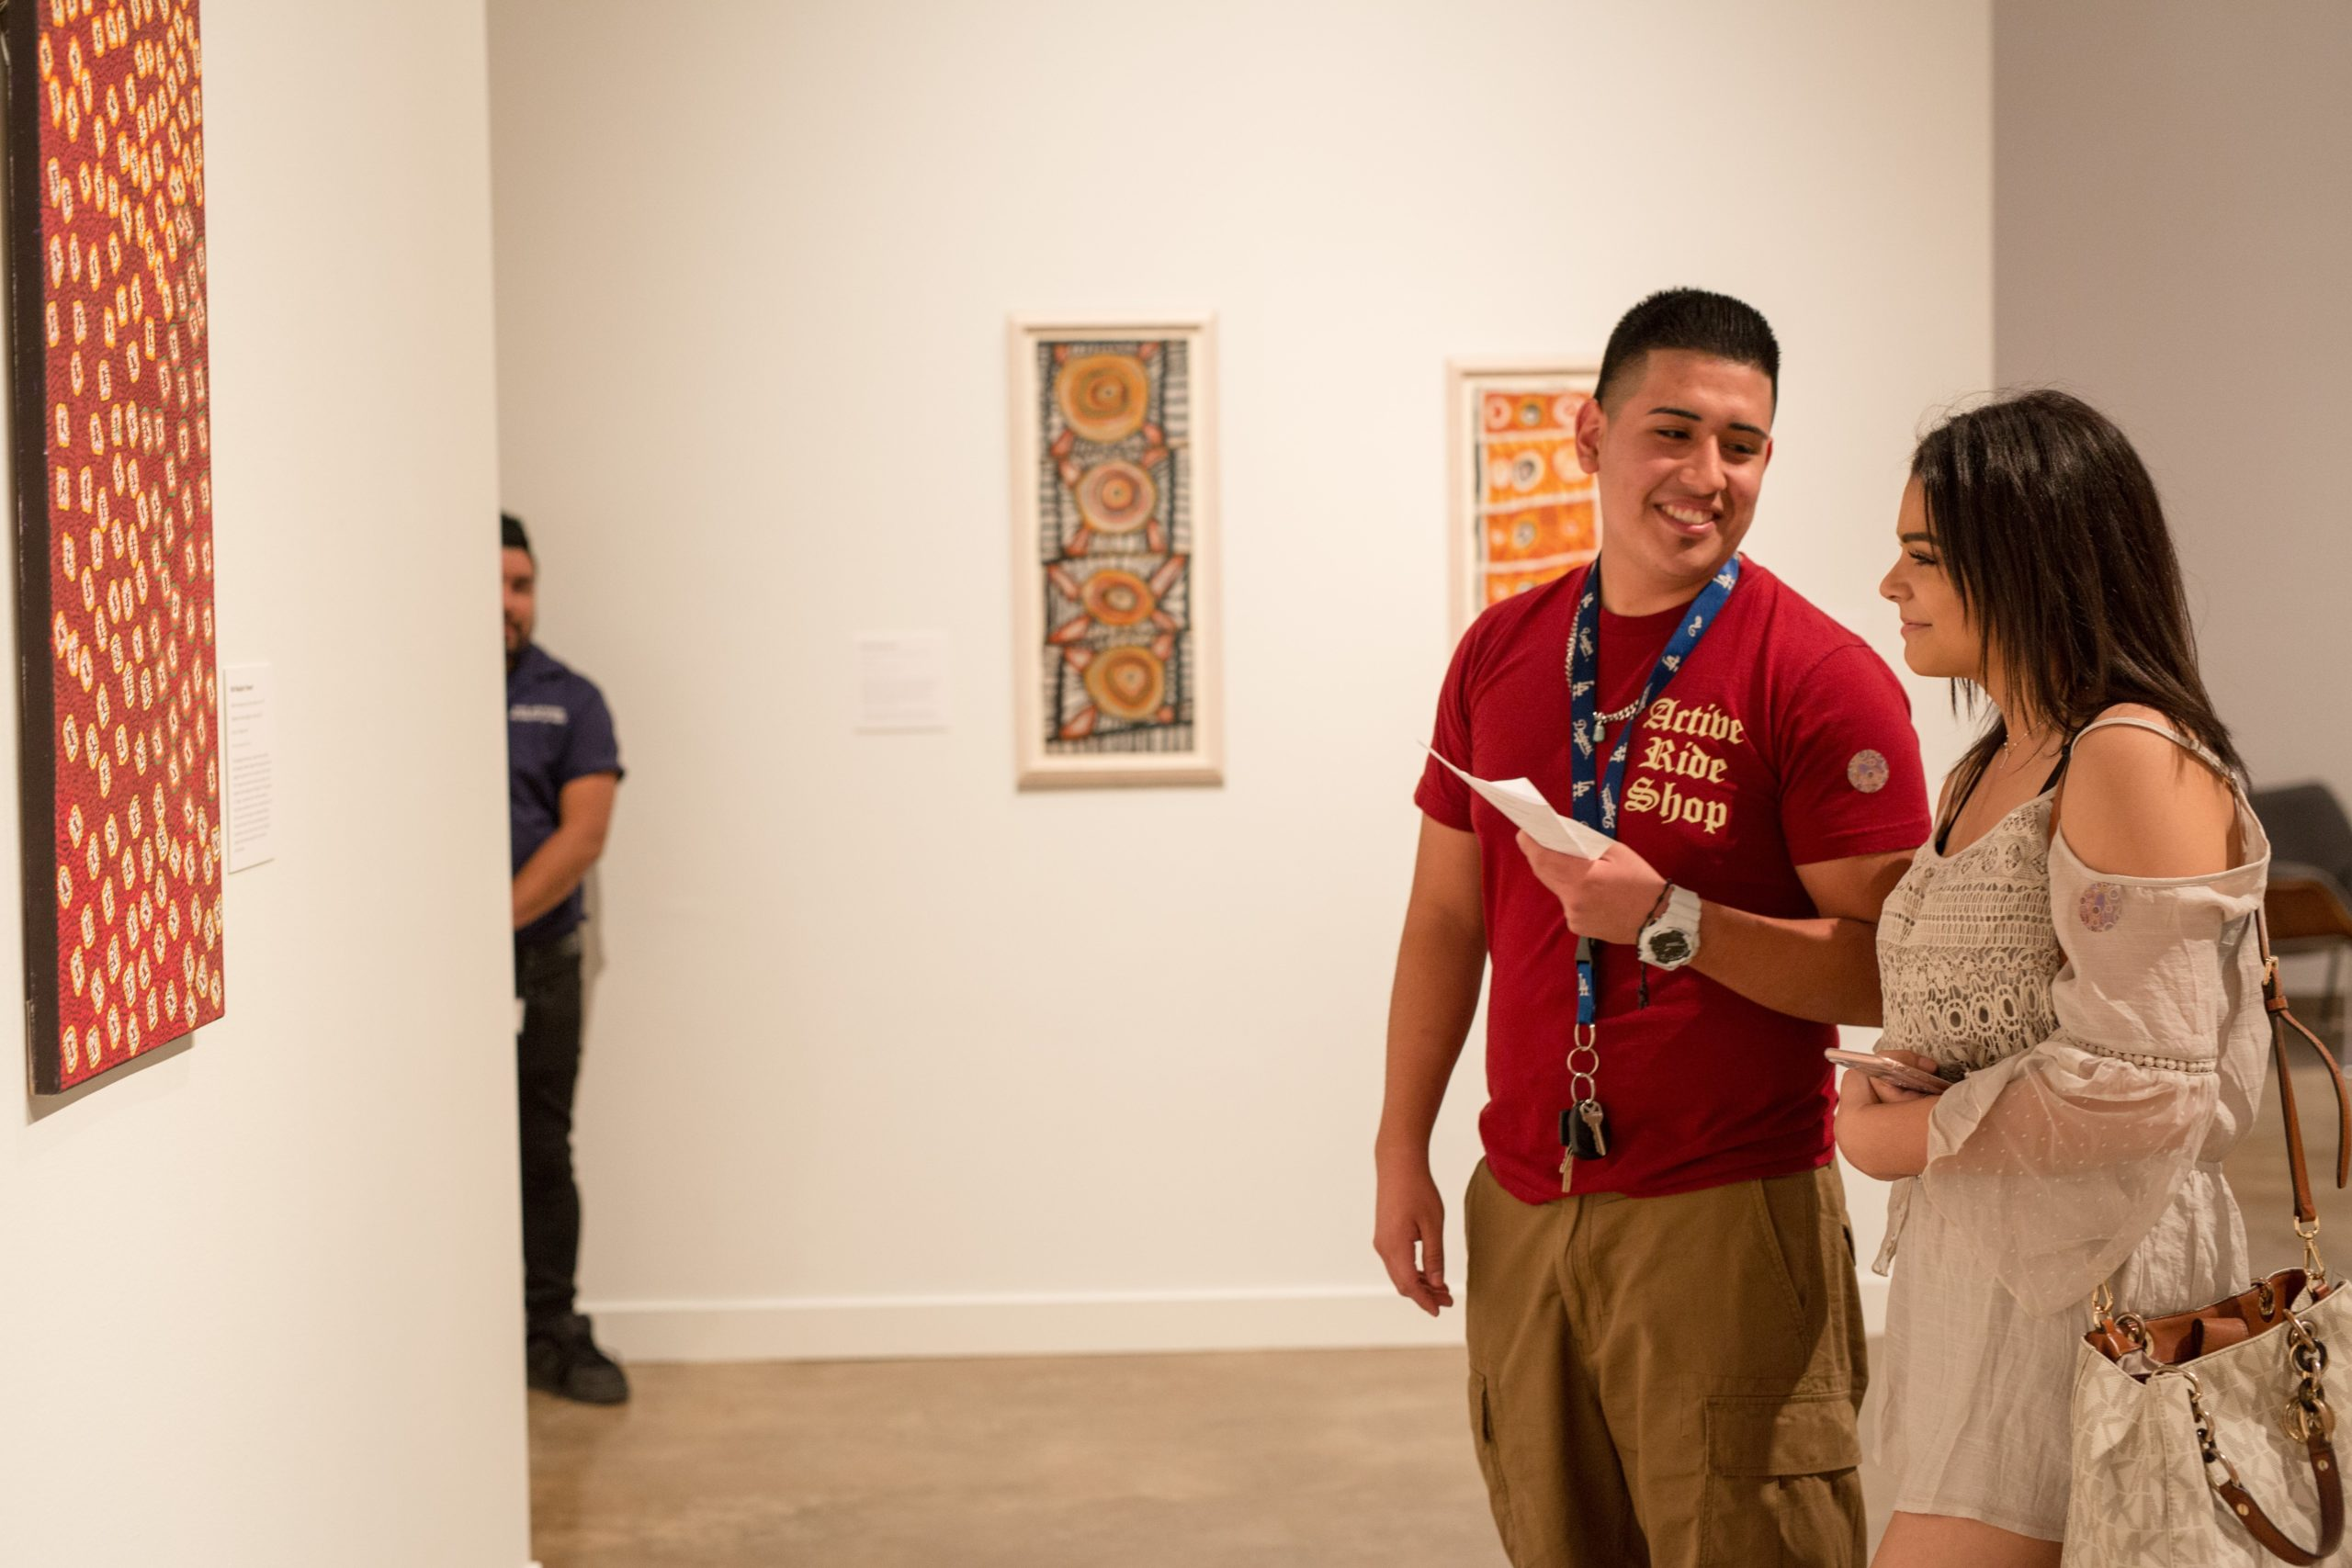 Couple Explores the San Antonio Museum of Art Courtesy of visitsanantonio.com